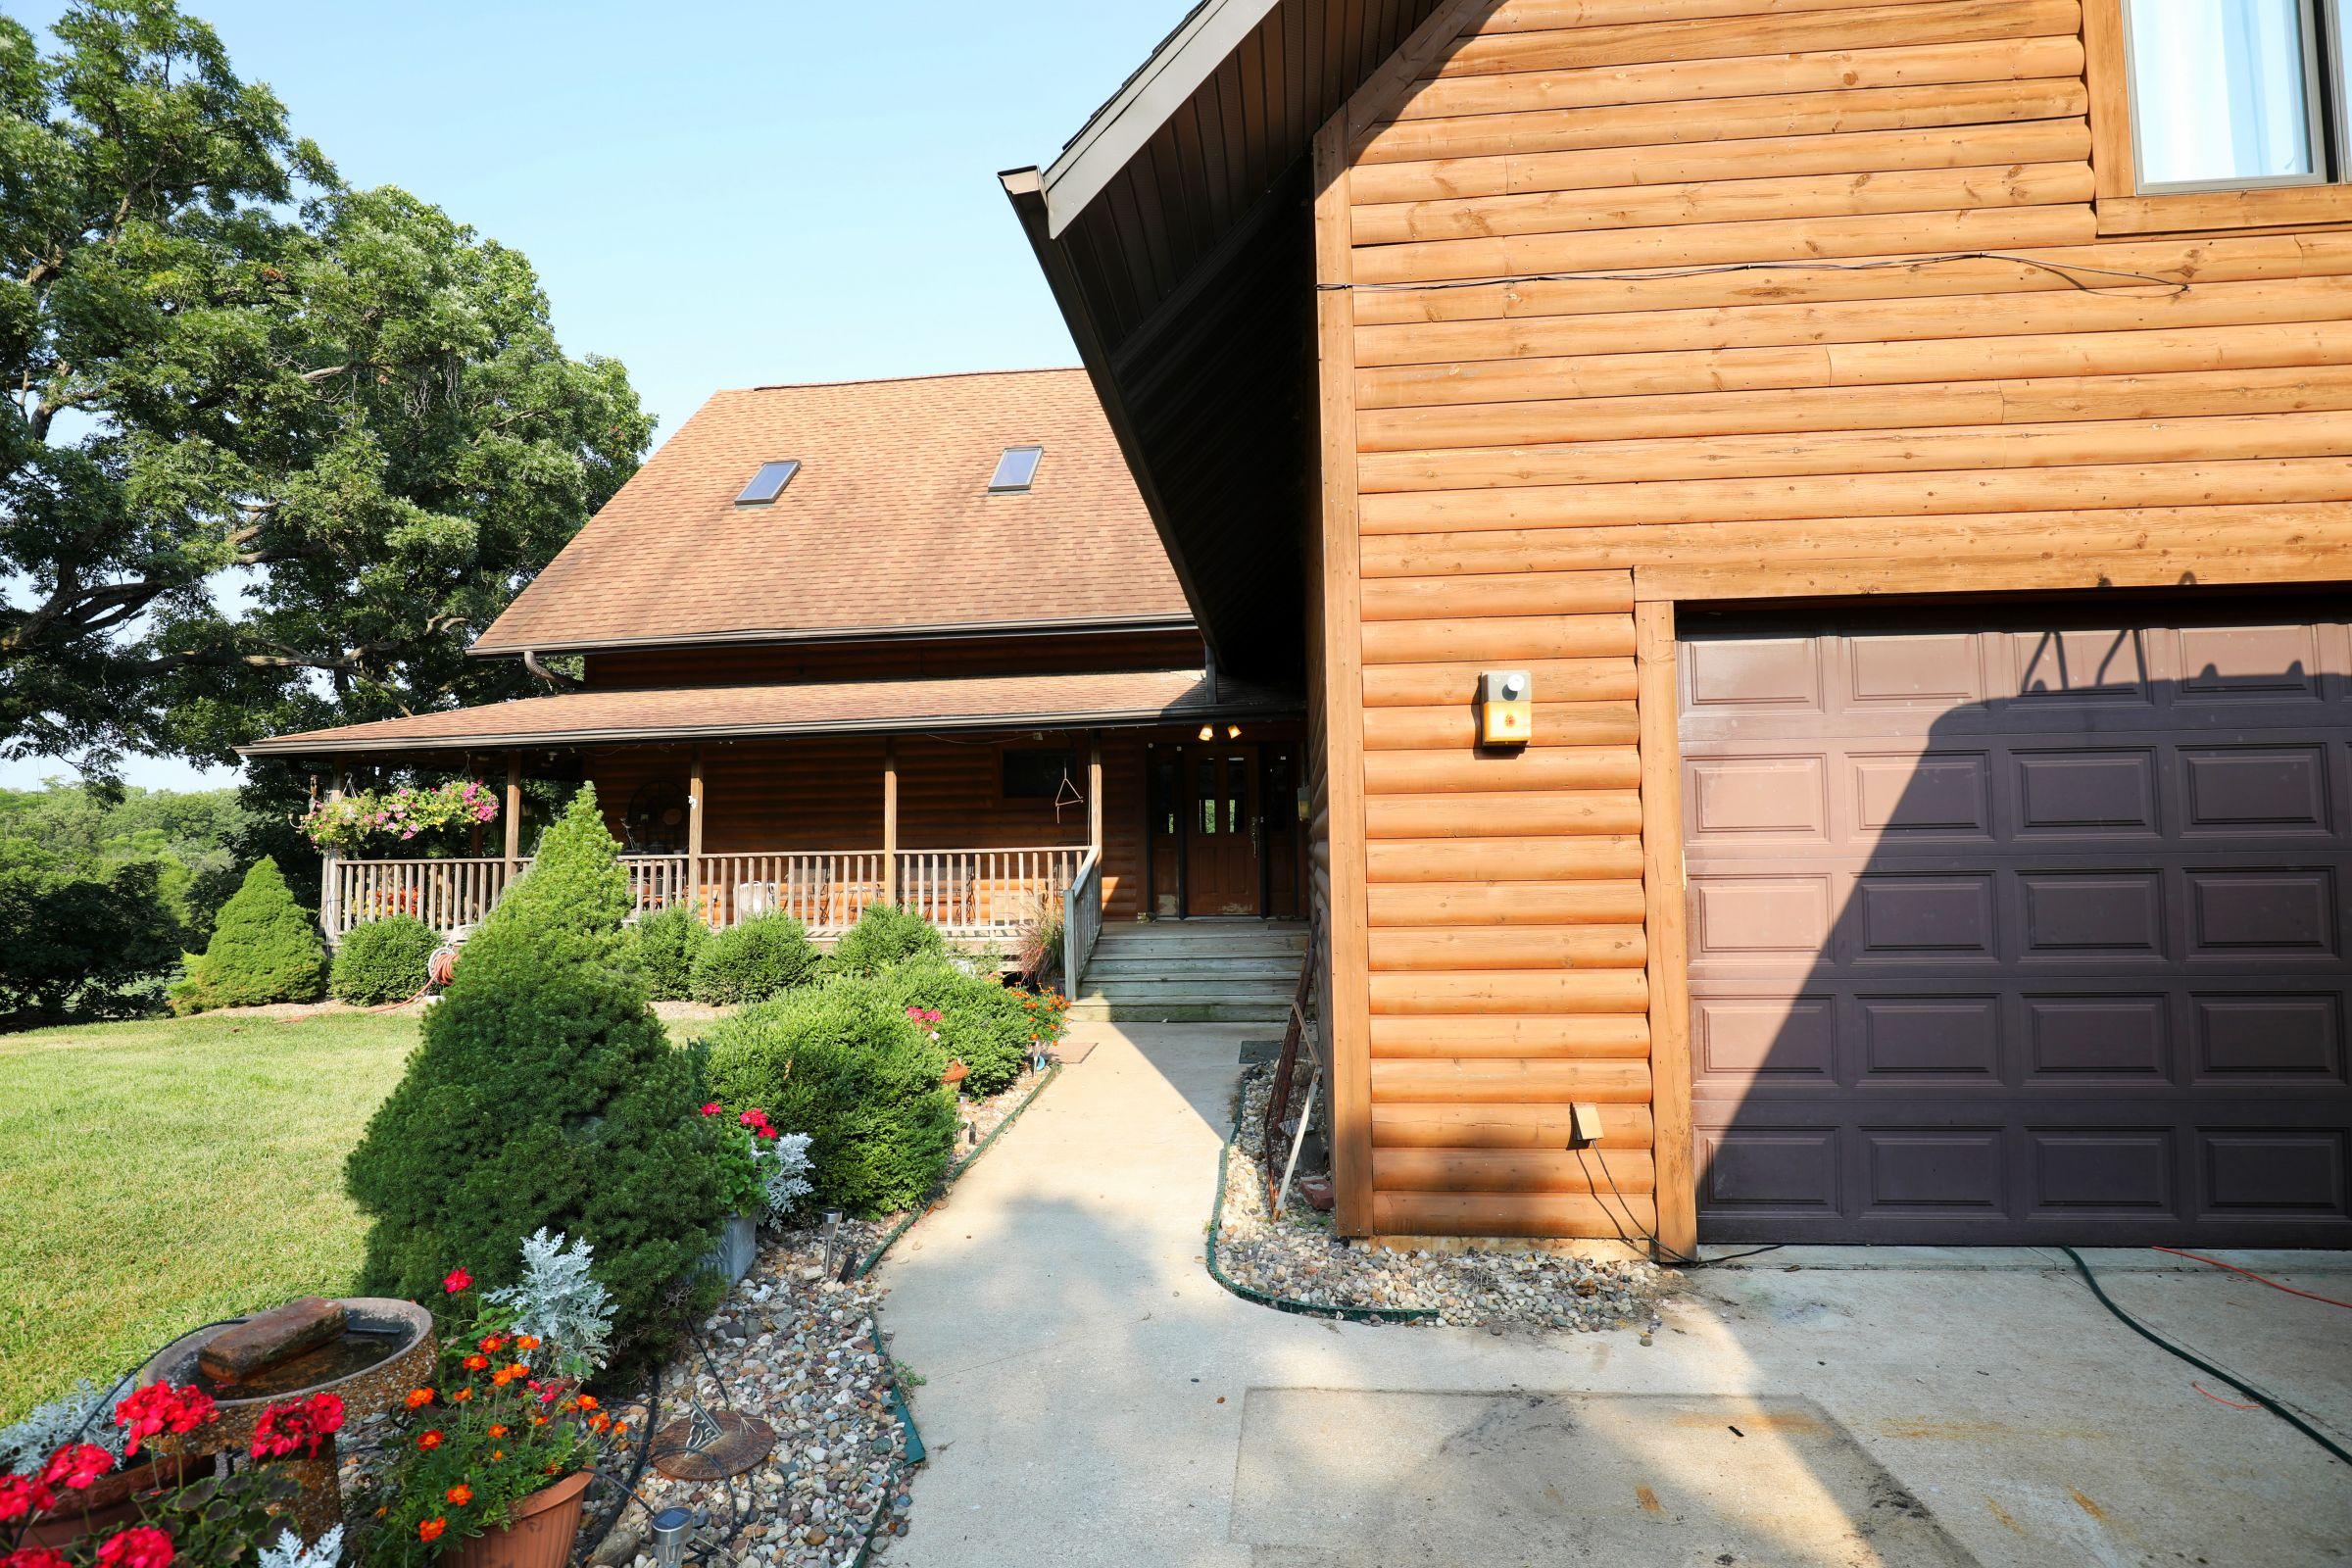 land-lee-county-iowa-328-acres-listing-number-15137-9-2020-08-27-174707.jpg